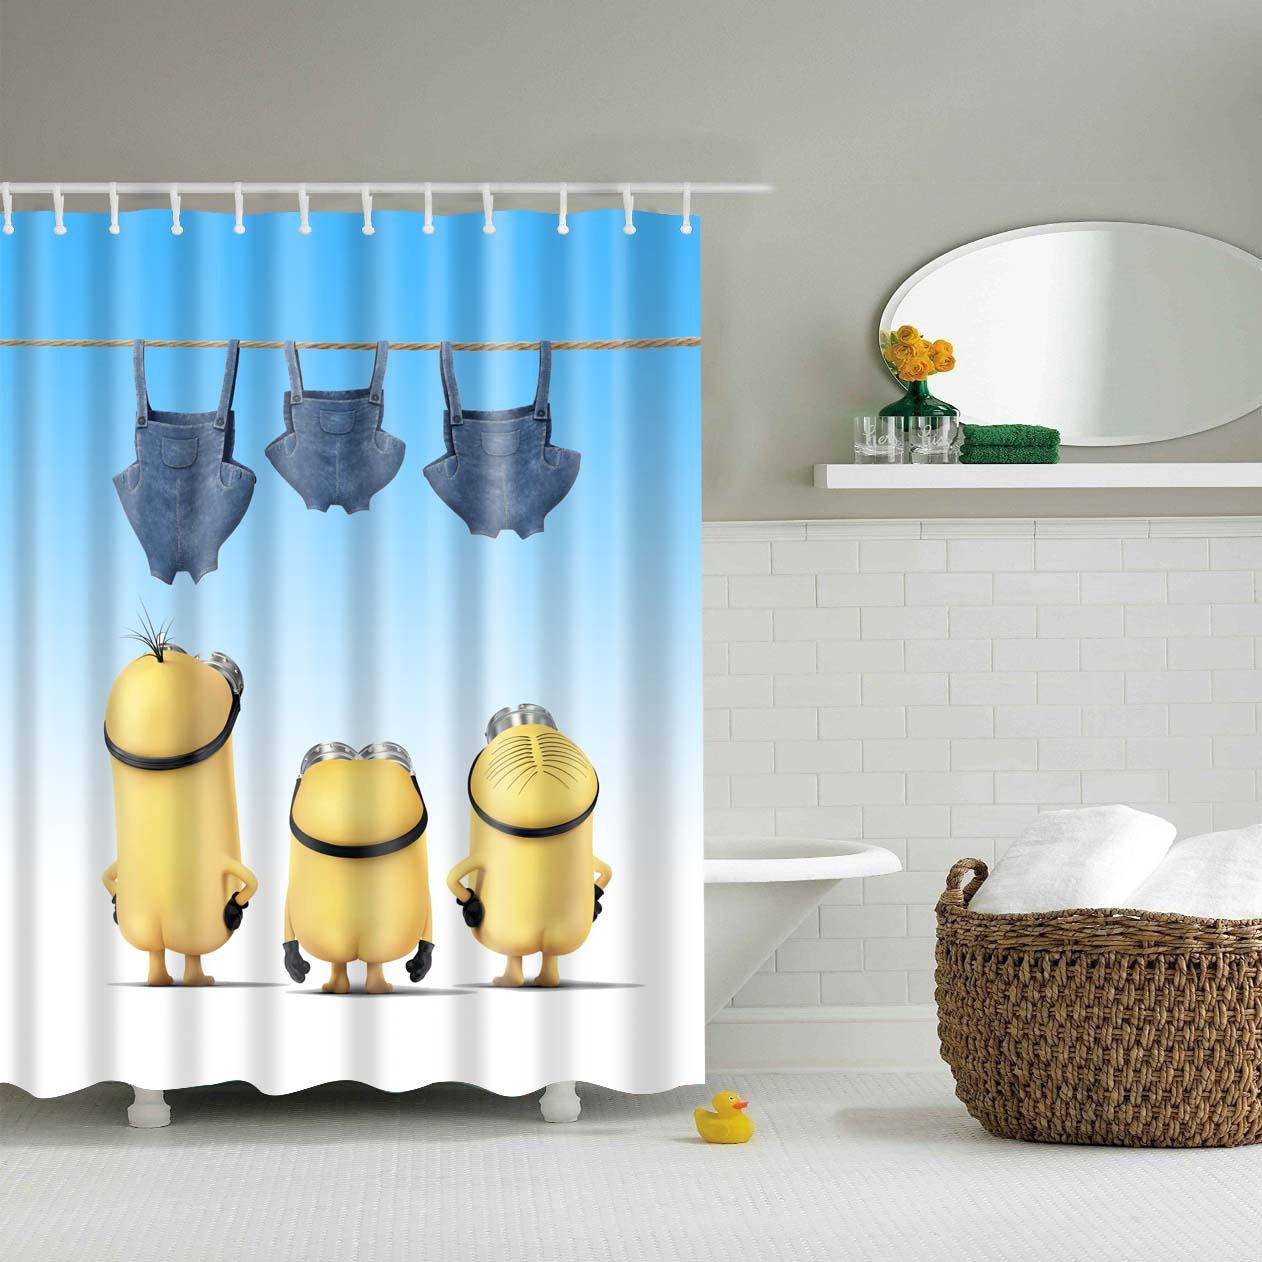 Waterproof Polyester Fabric 3D Cartoon Bathroom Shower Curtains Yellow Minions Blackout Bathroom Curtains Long 180X200cm